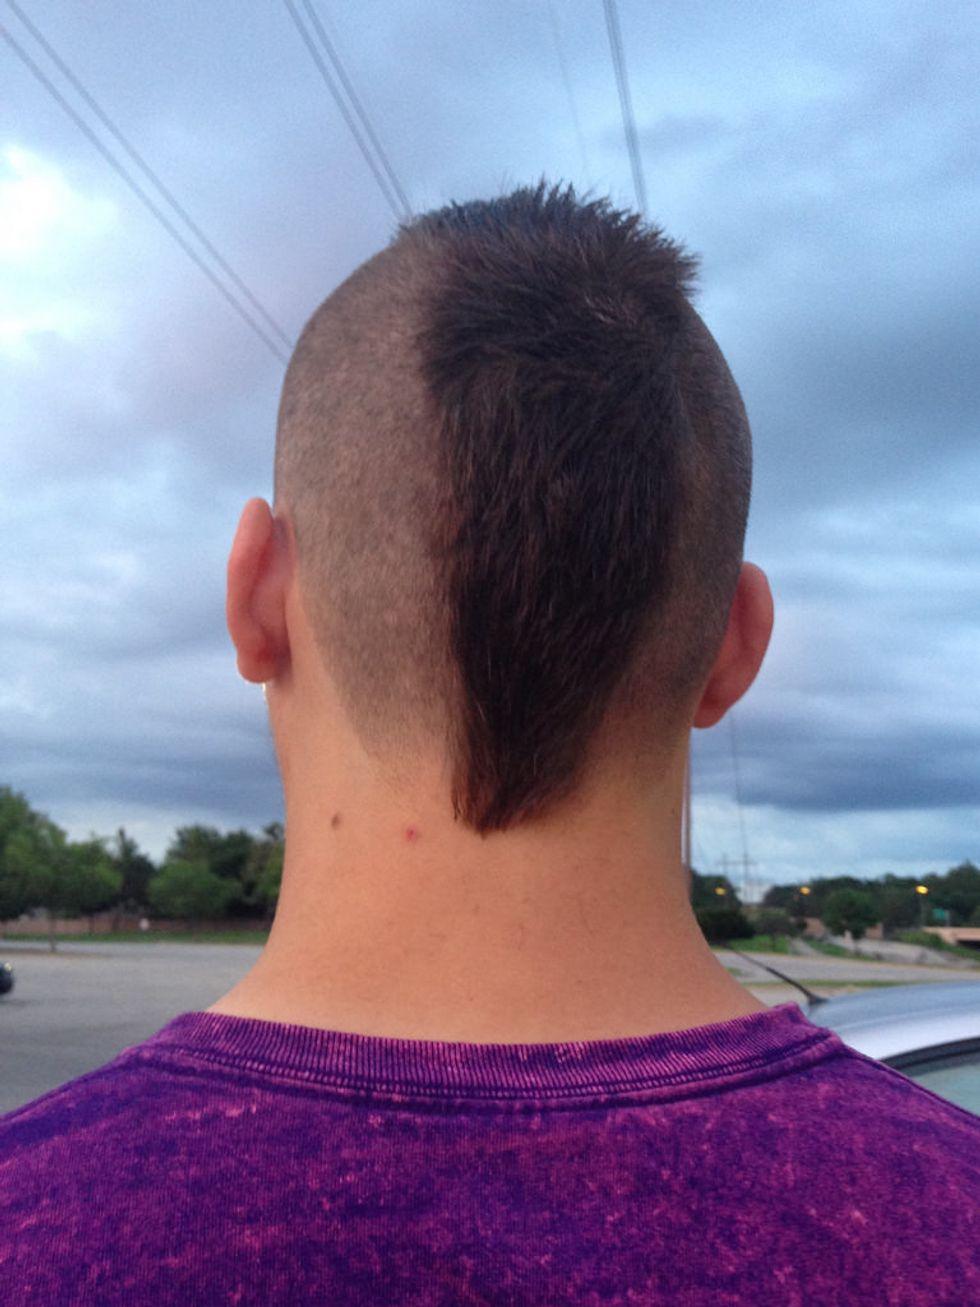 https://mitchquick.files.wordpress.com/2016/02/bad-haircut11.jpg